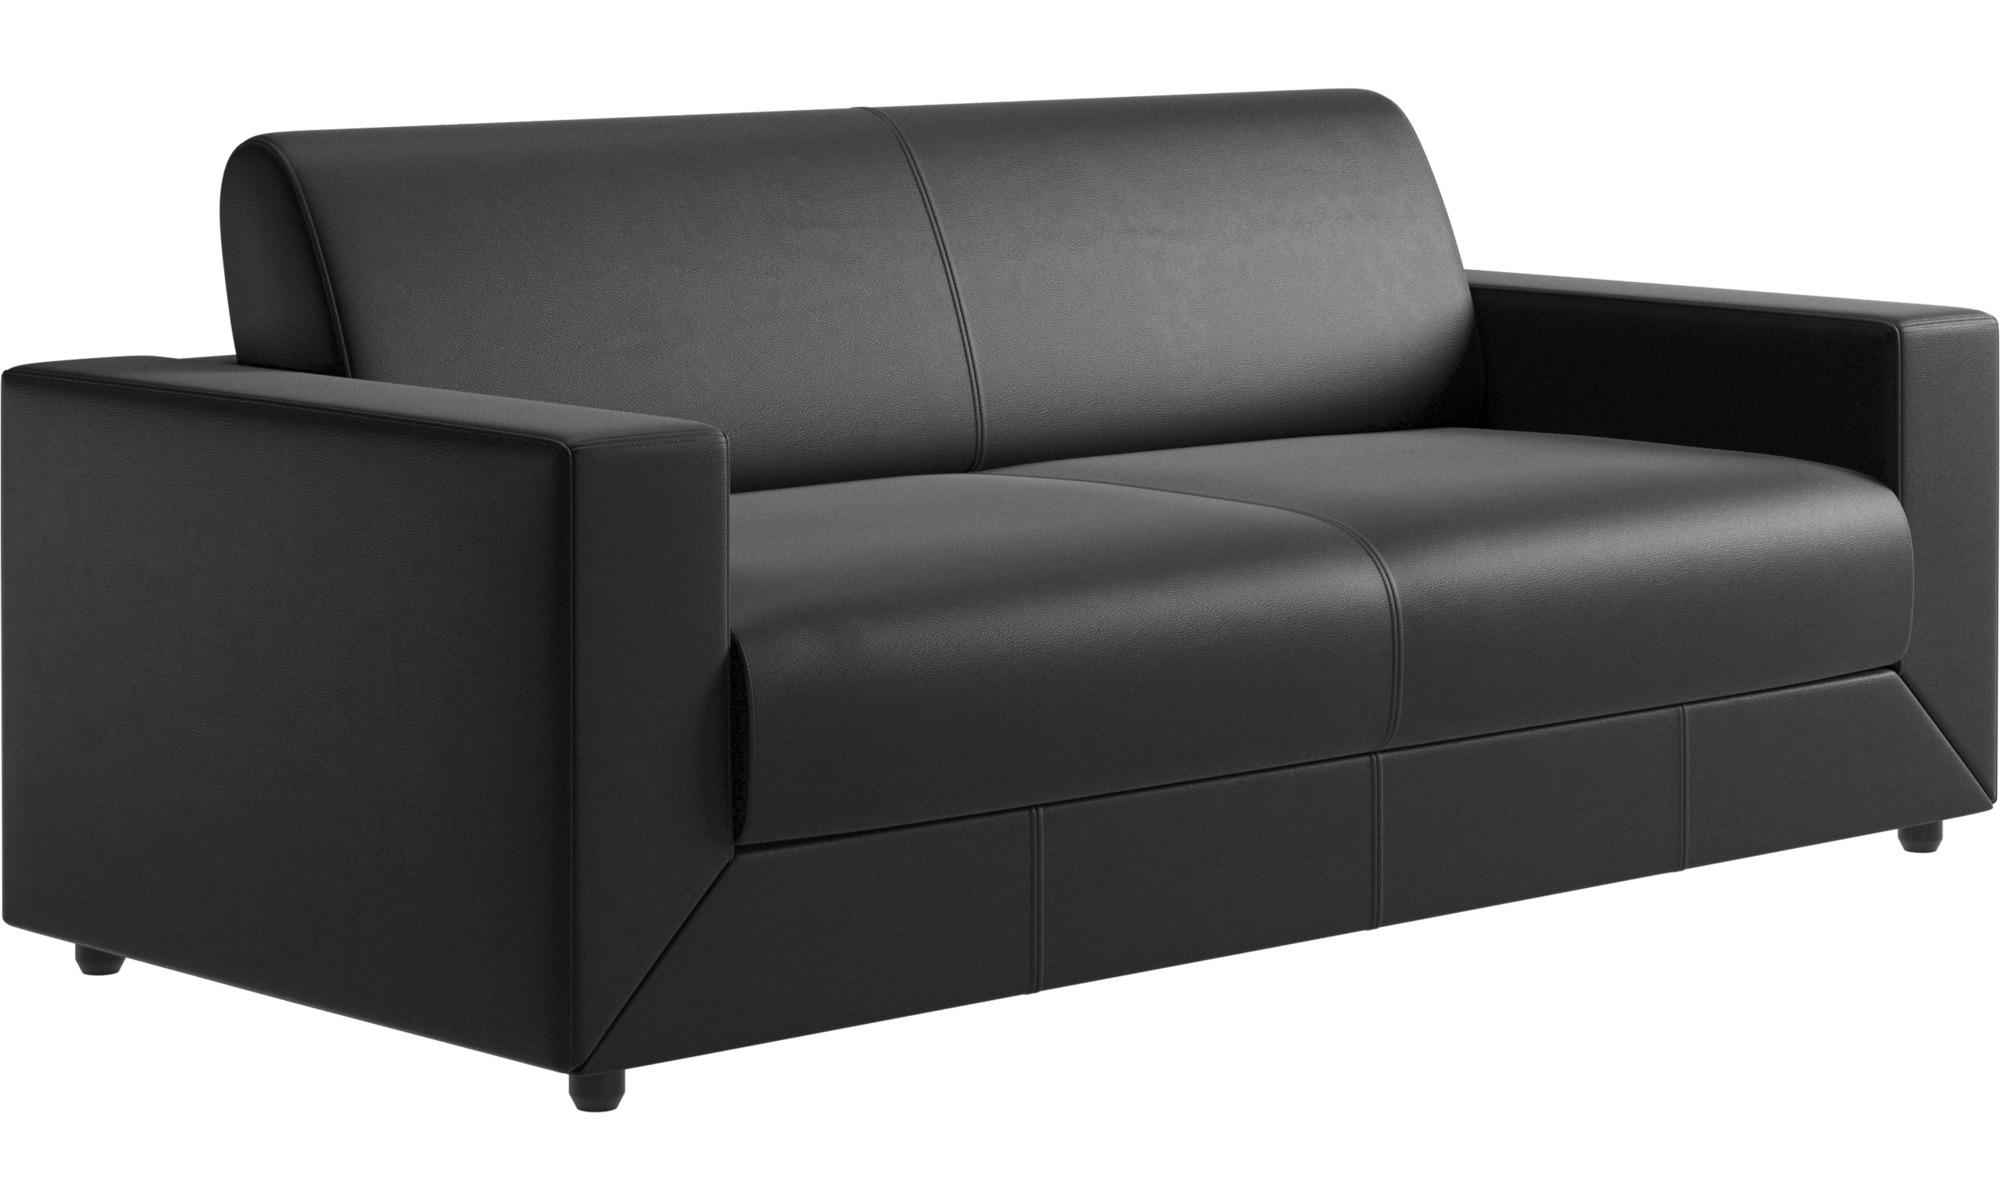 sofy rozk adane sofa stockholm z funkcj spania boconcept. Black Bedroom Furniture Sets. Home Design Ideas